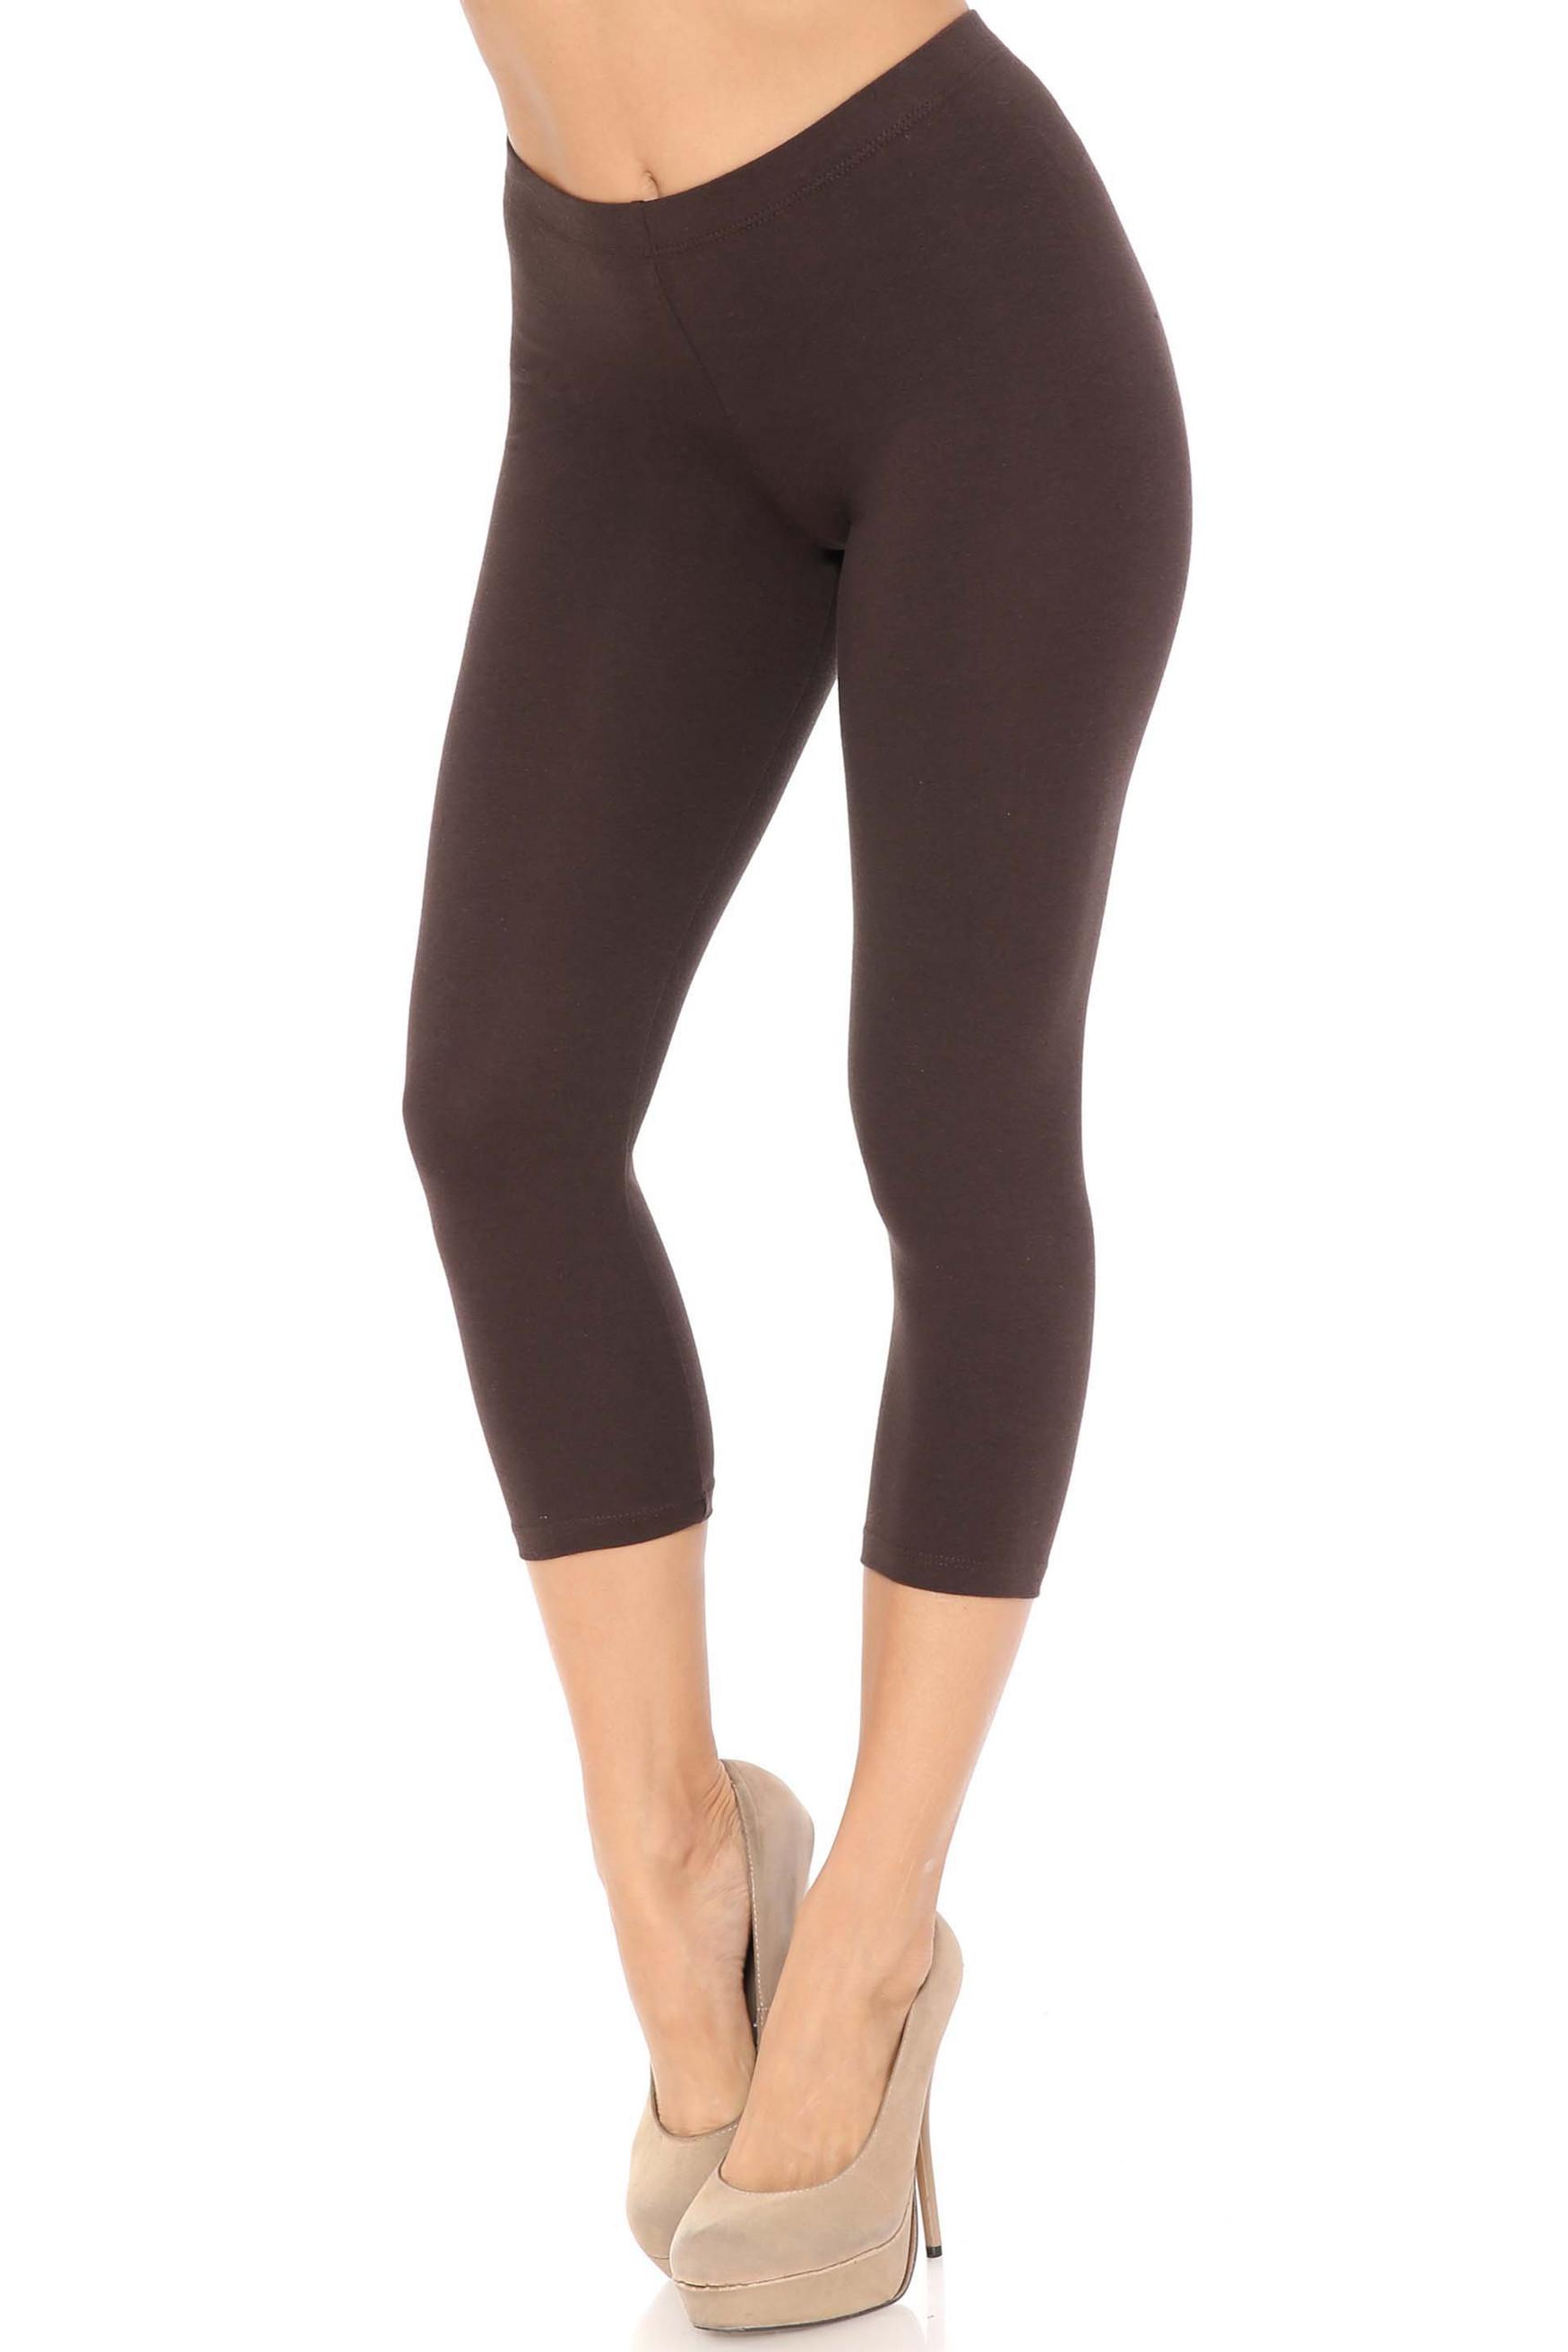 45 degree angle of brown USA Cotton Capri Length Leggings